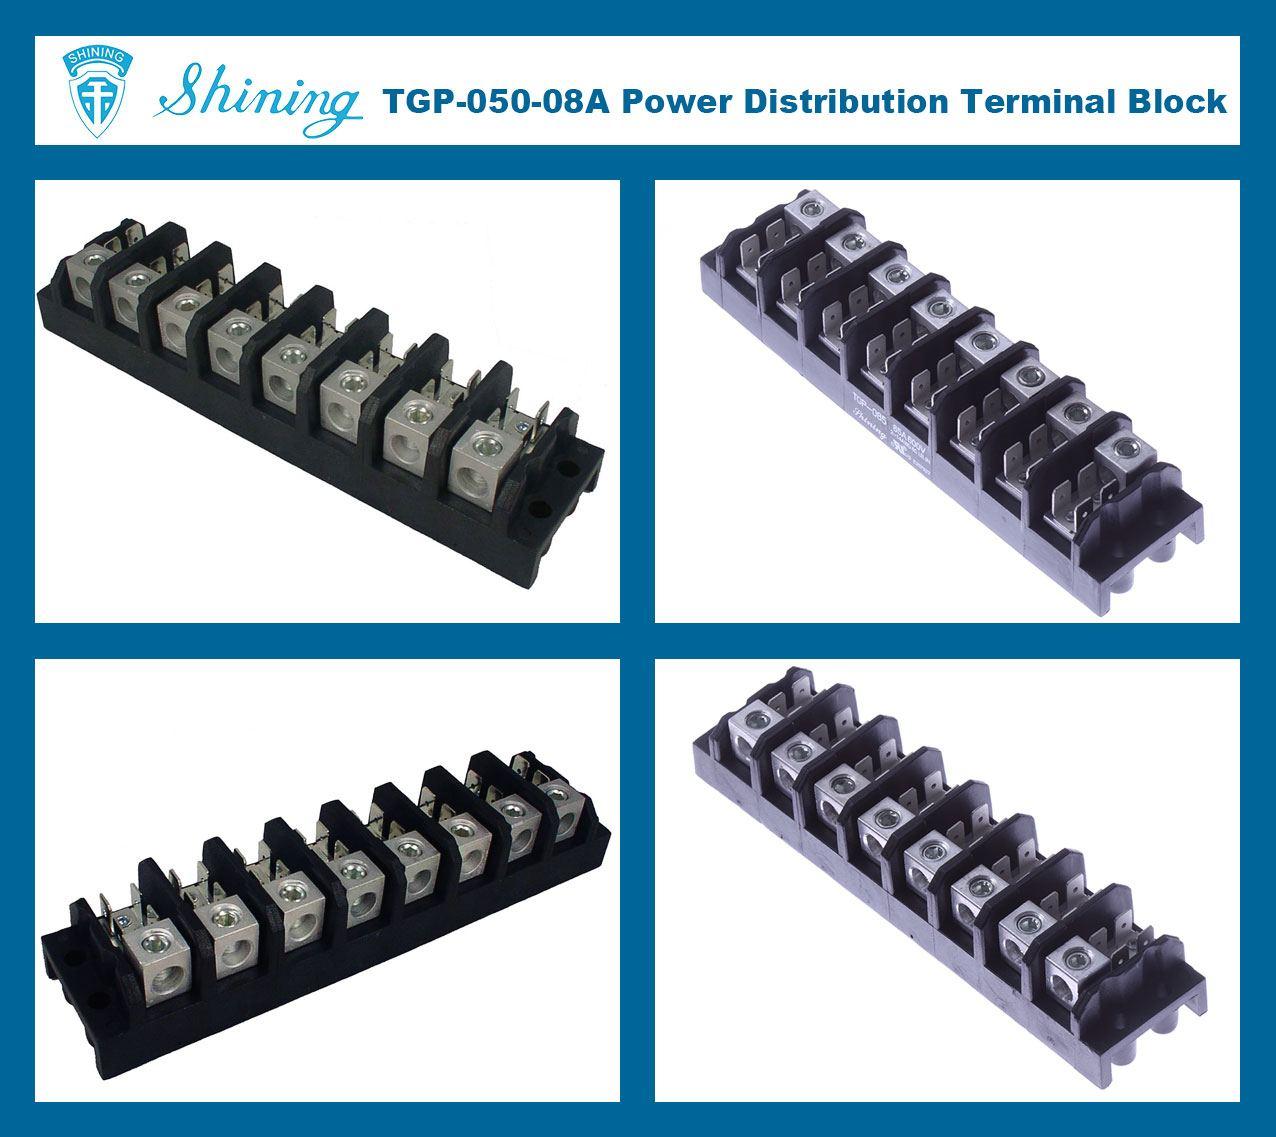 TGP-050-08A 600V 50A 8 Pole Electrical Power Terminal Block